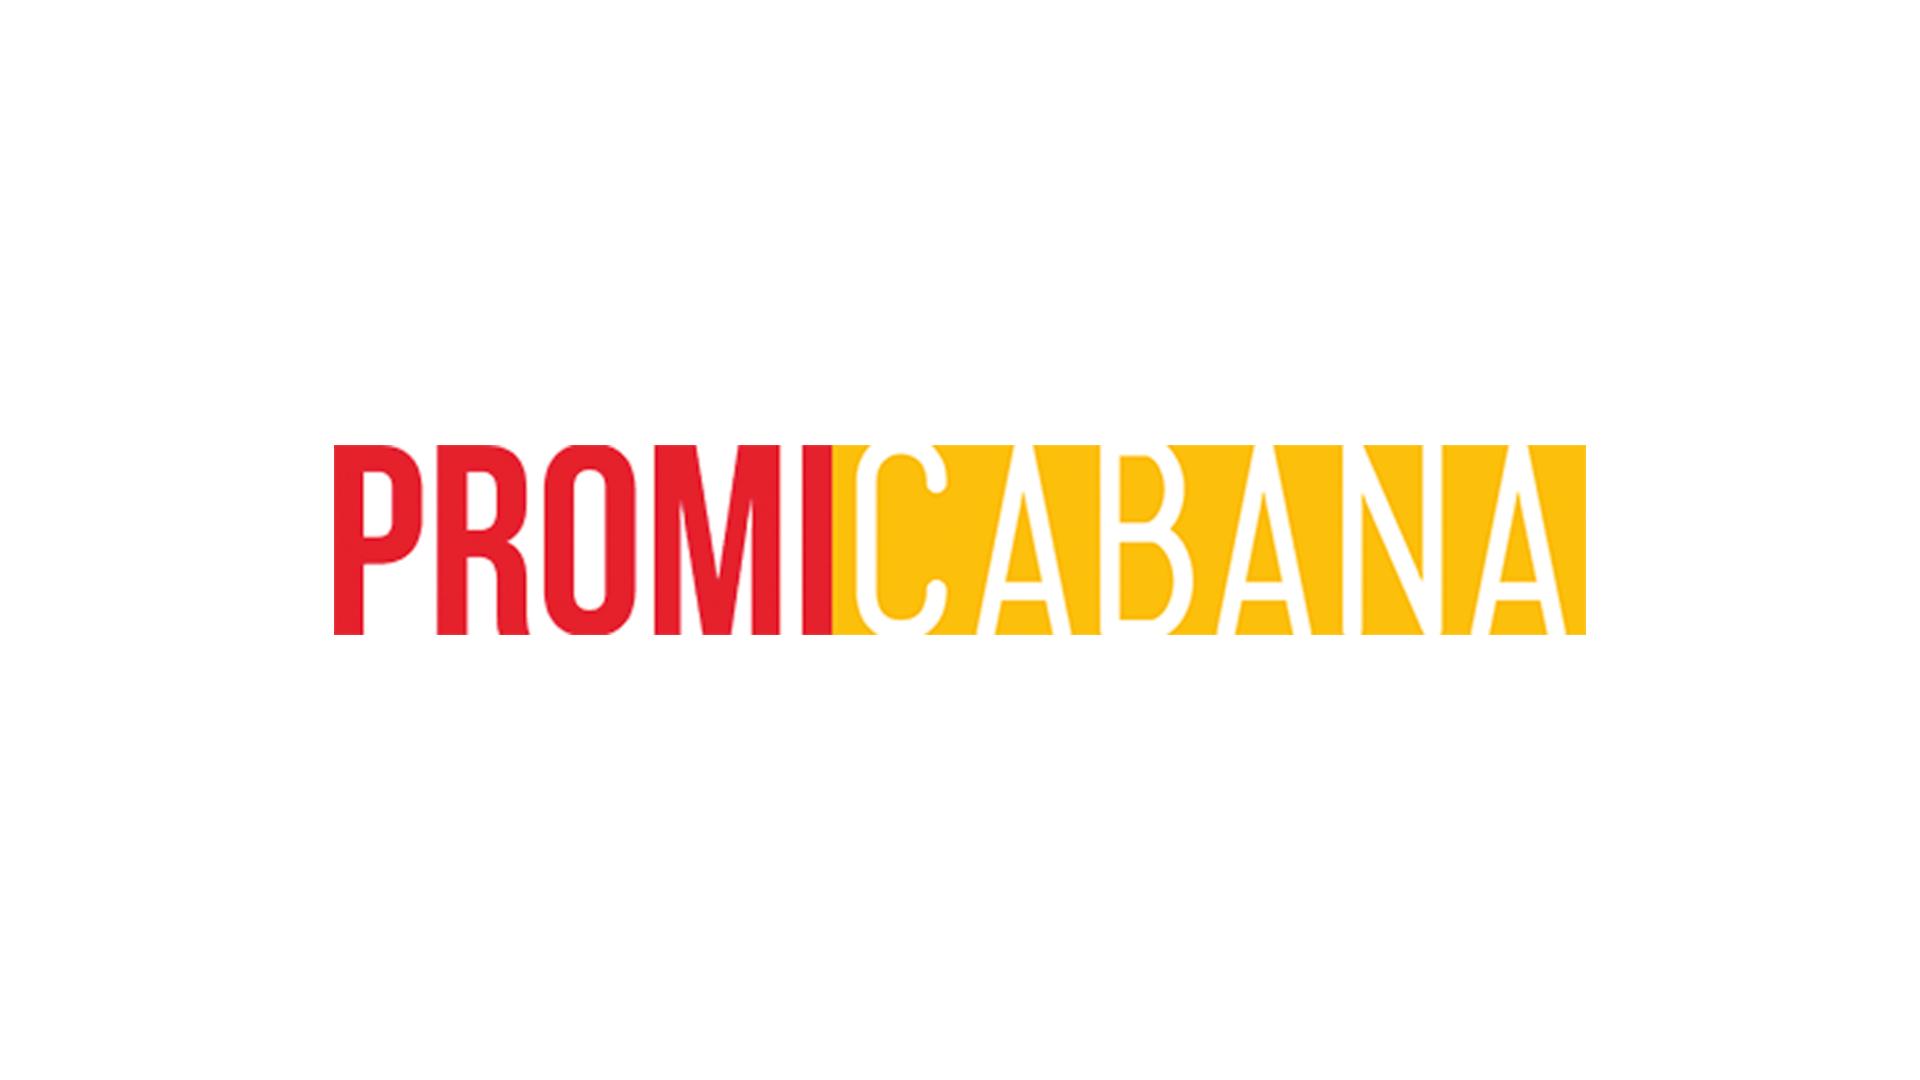 Kanye-West-Famous-Musikvideo-Taylor-Swift-Kim-Kardashian-Rihanna